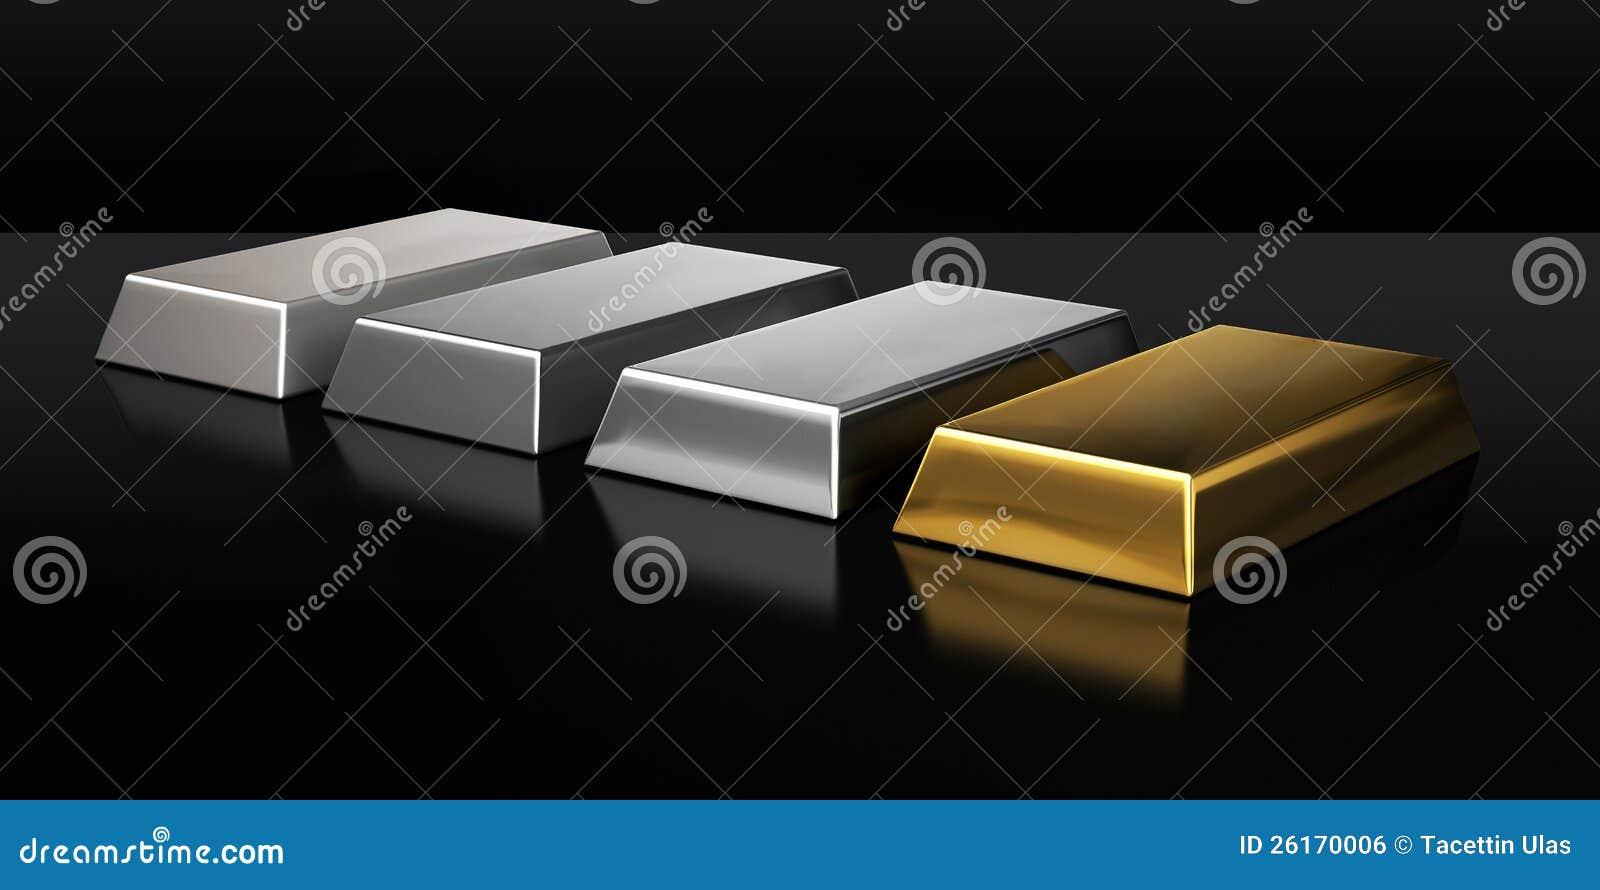 Set of valuable metal ingots